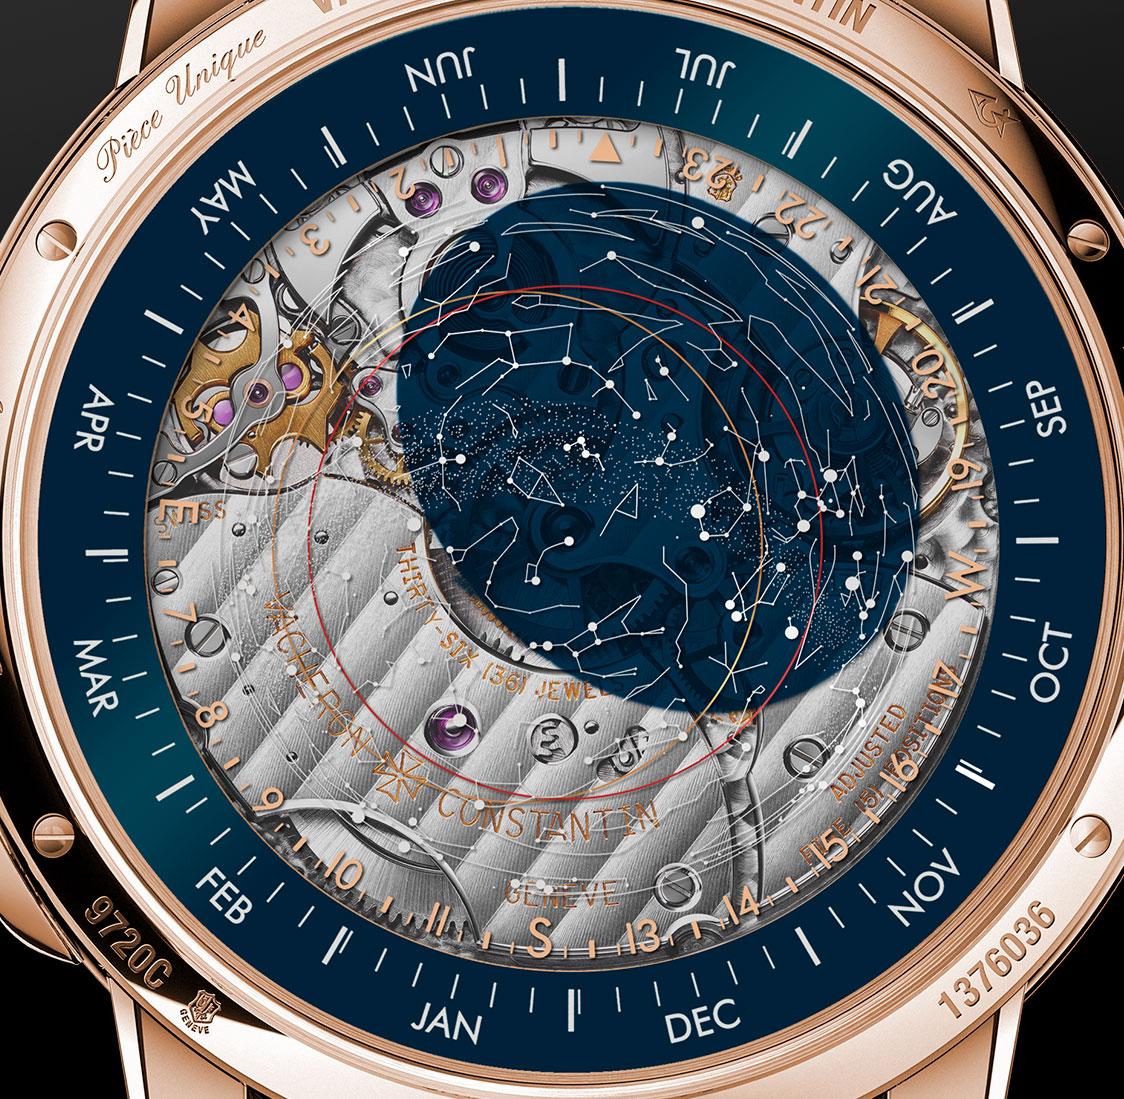 Les Cabinotiers Astronomical Grand Complication Sonnerie reverso